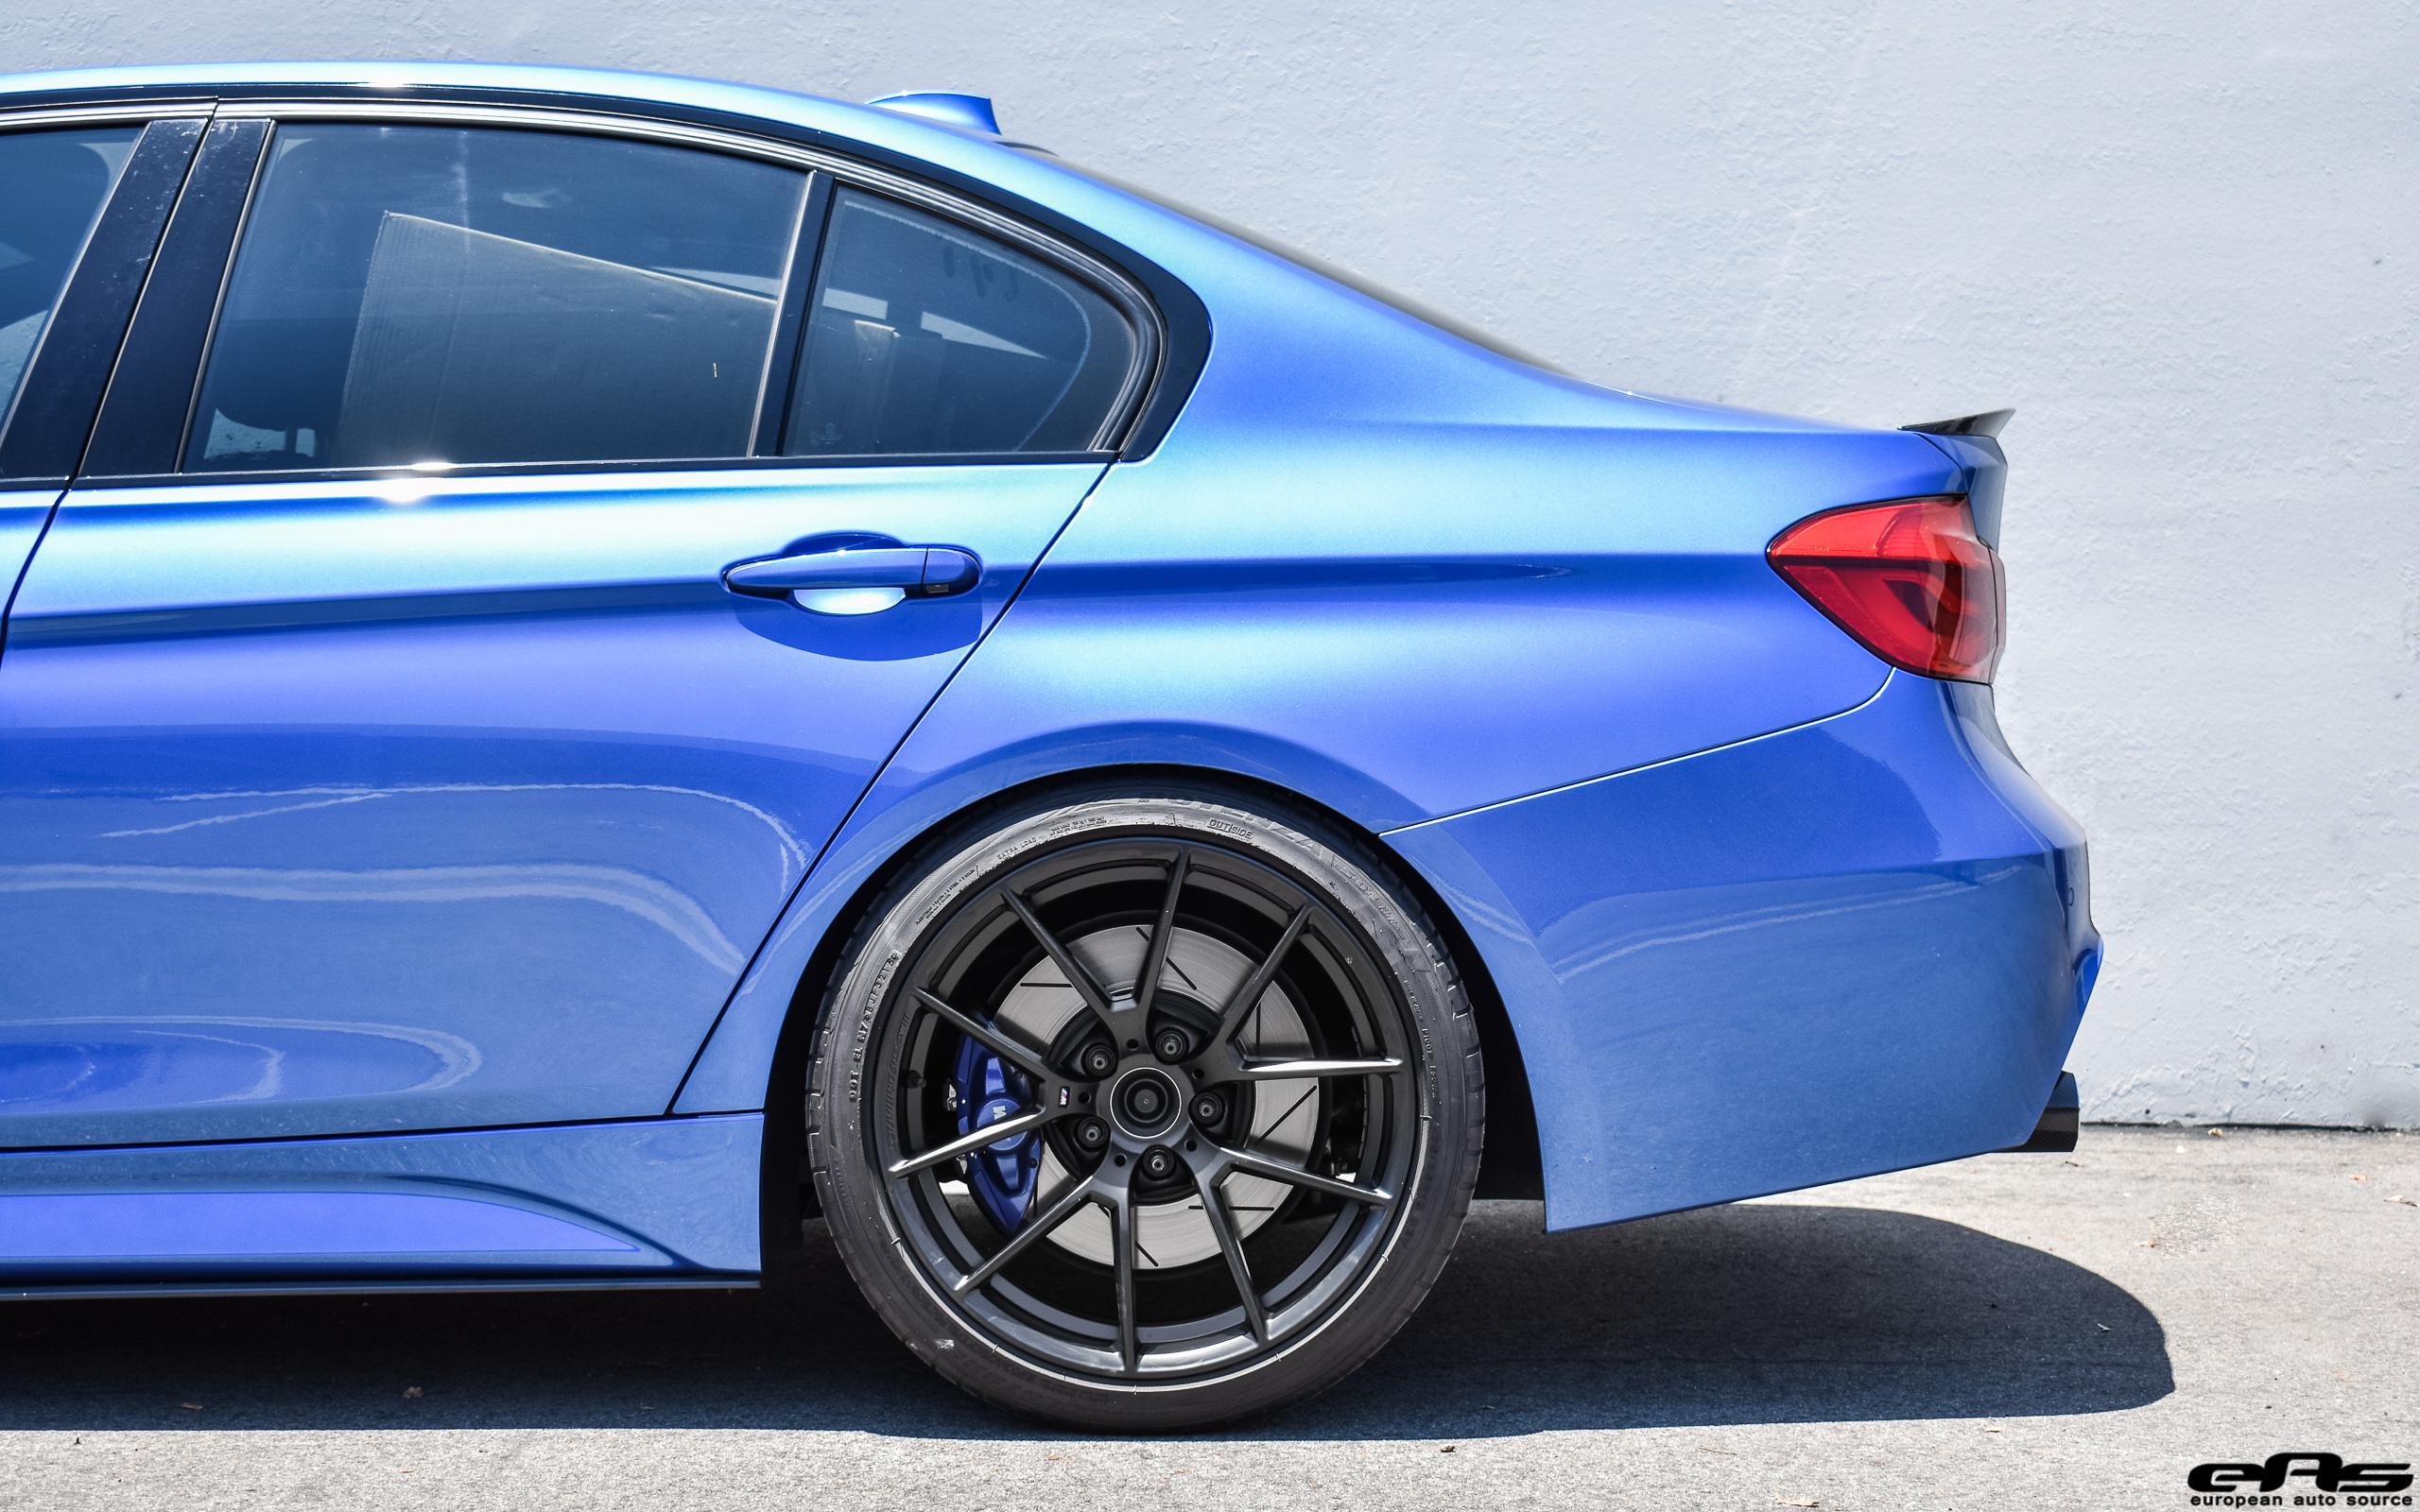 47c2f8d4e013 BMW - M Performance Carbon Fiber Rear Spoiler · BMW - M Performance Side  Blade Attachments - BMW F30 3-Series M-Sport